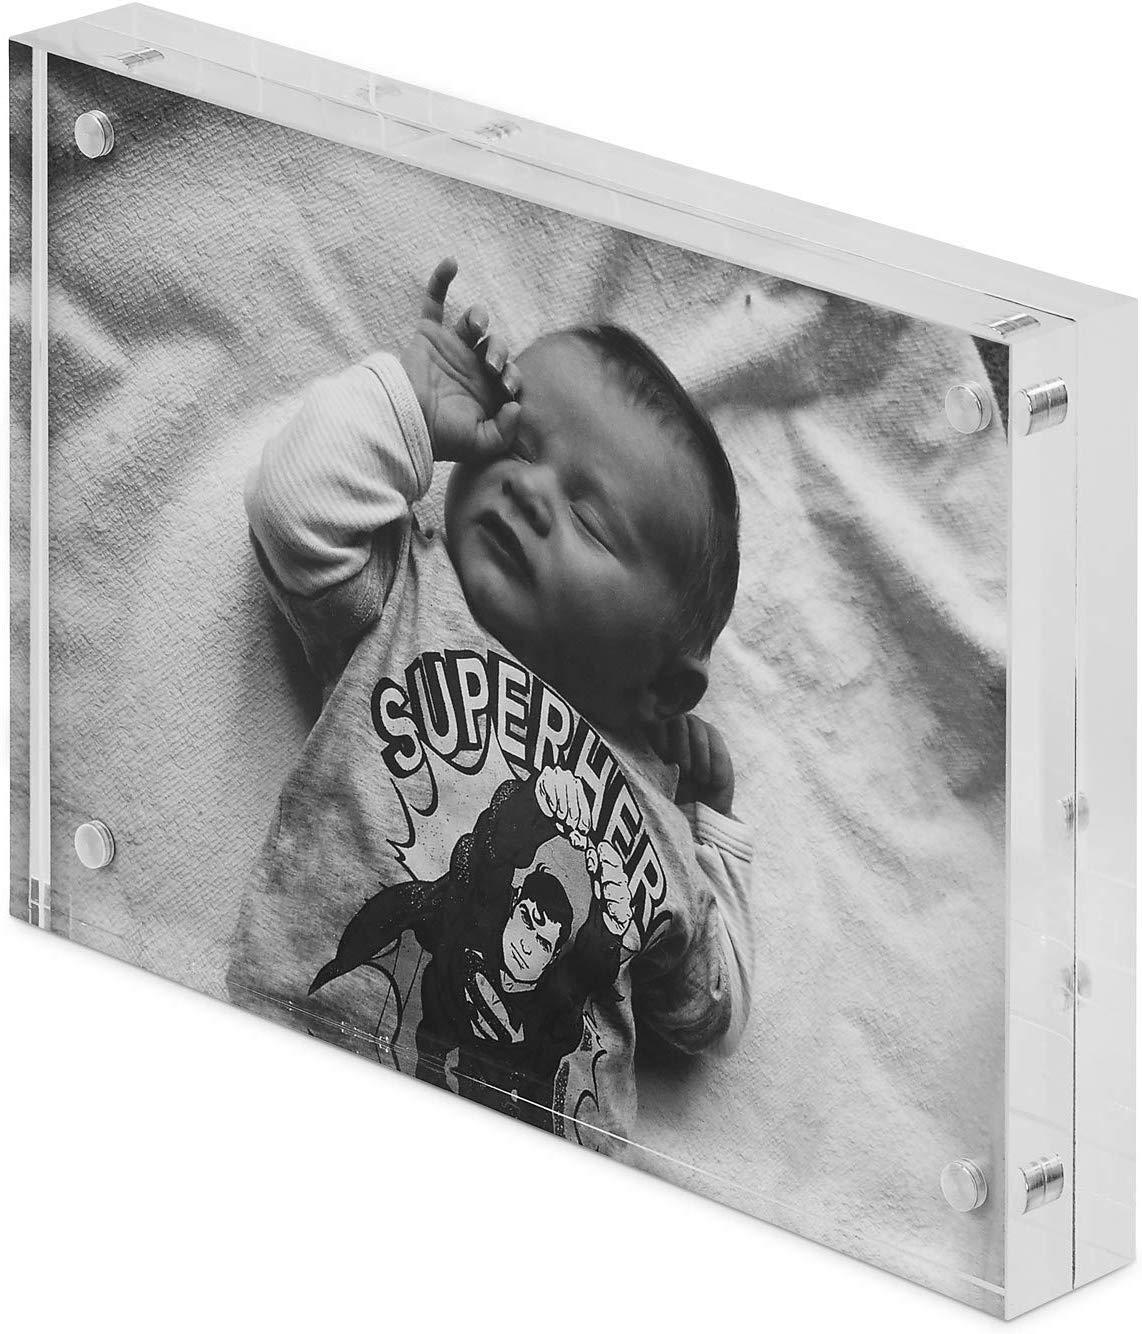 Scribble 6 x 4 Acrylic Photo Frame